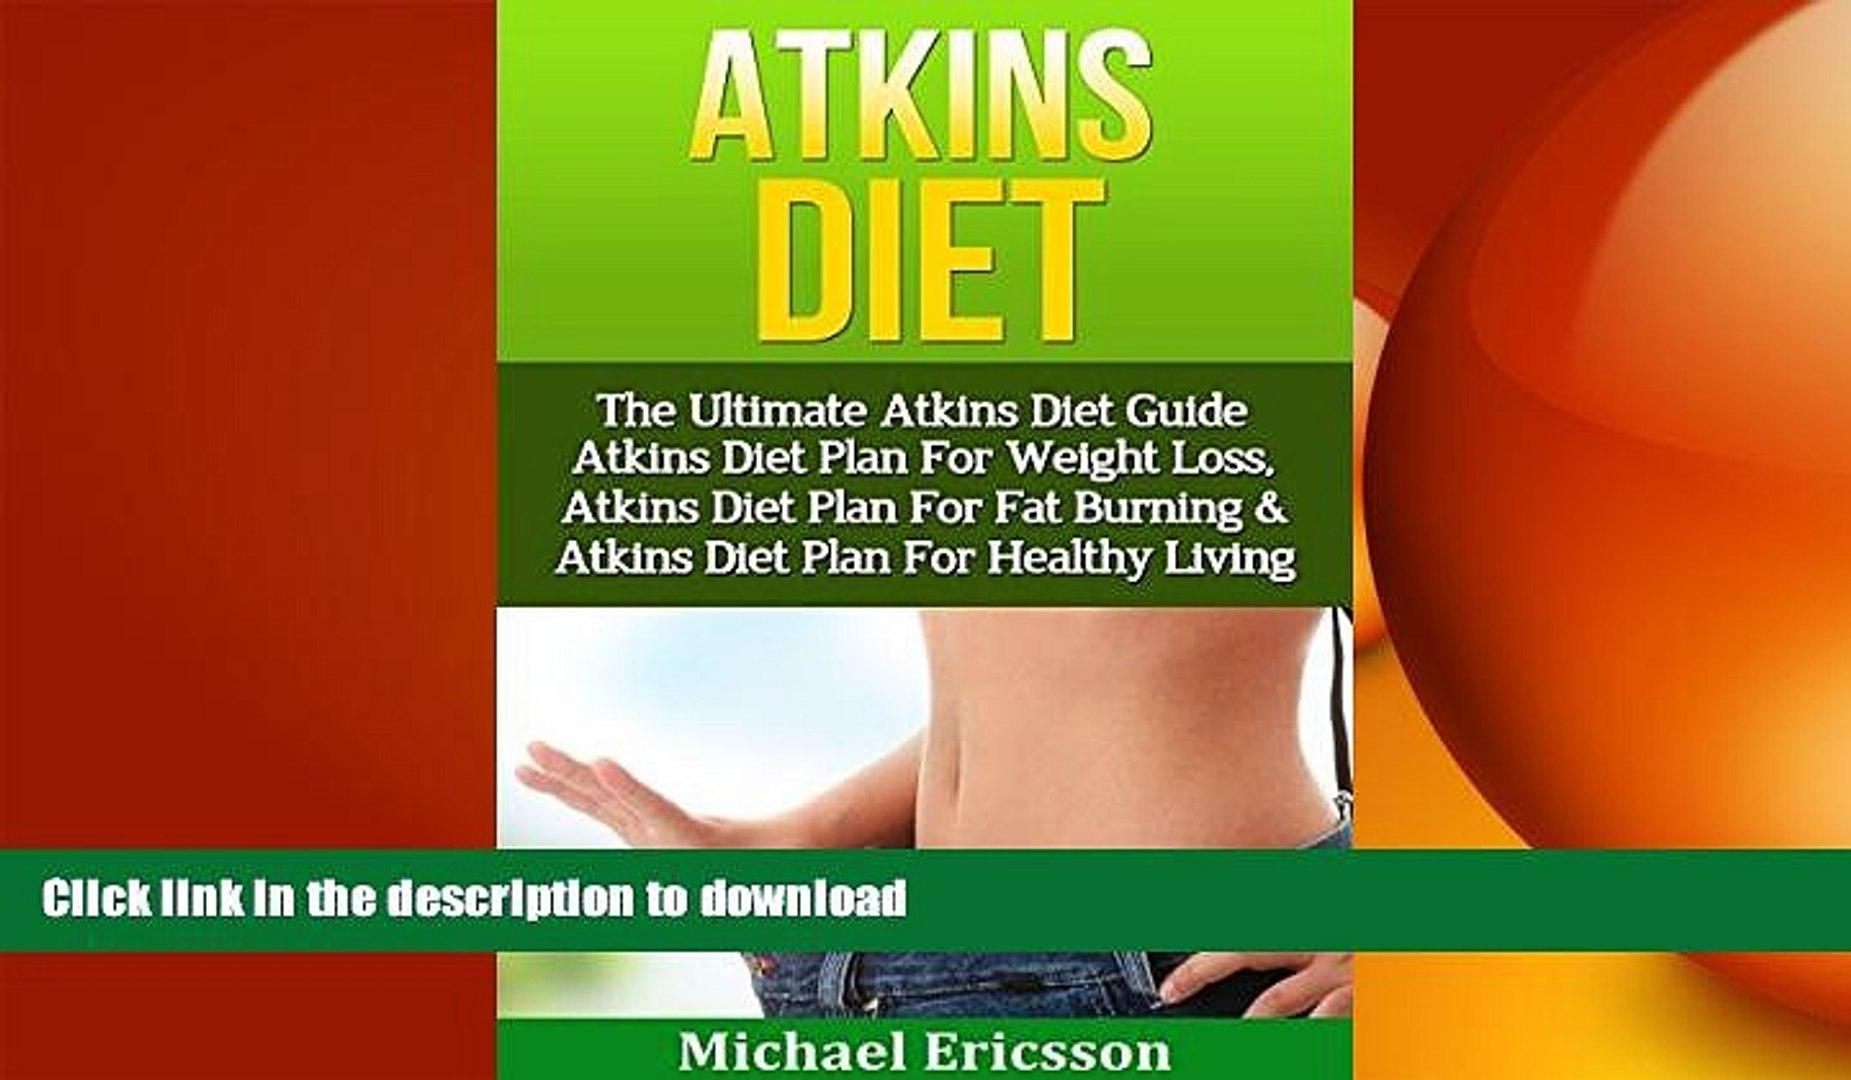 READ  ATKINS DIET: The Ultimate Atkins Diet Guide - Atkins Diet Plan For Weight Loss, Atkins Diet